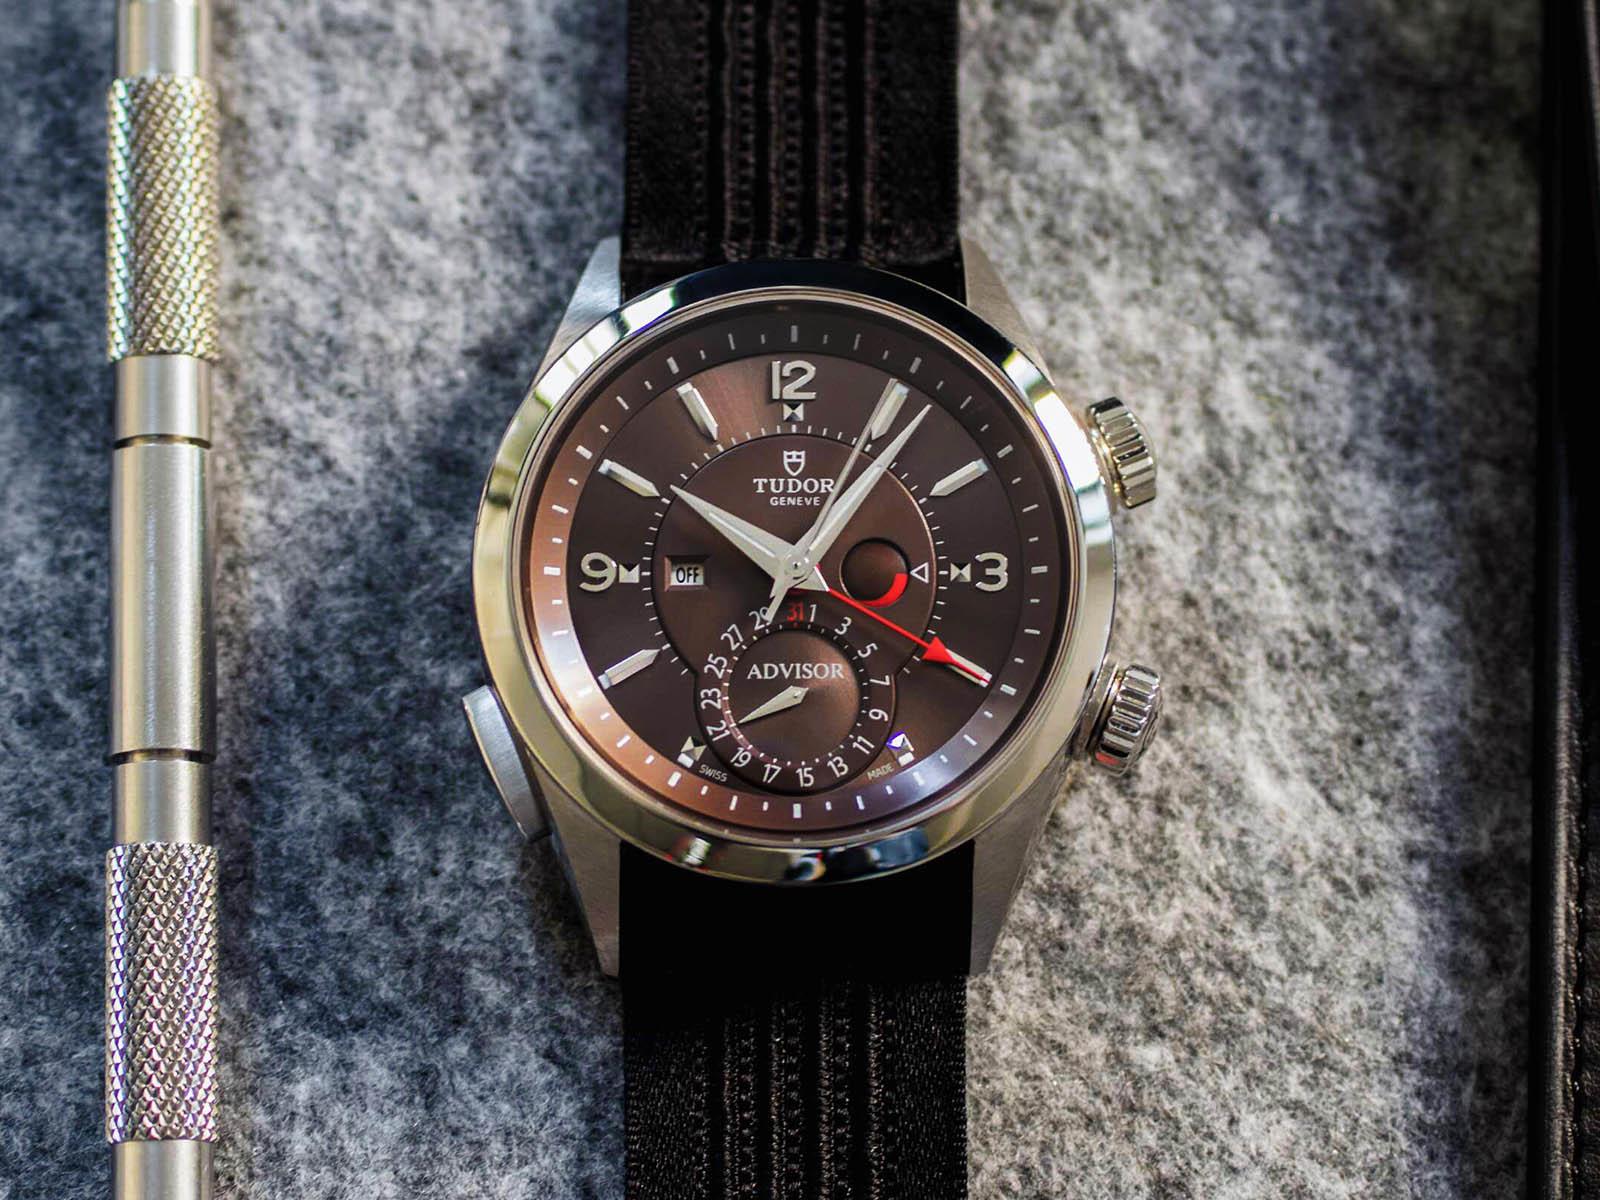 mechanical-alarm-watches-tudor-heritage-advisor-1.jpg